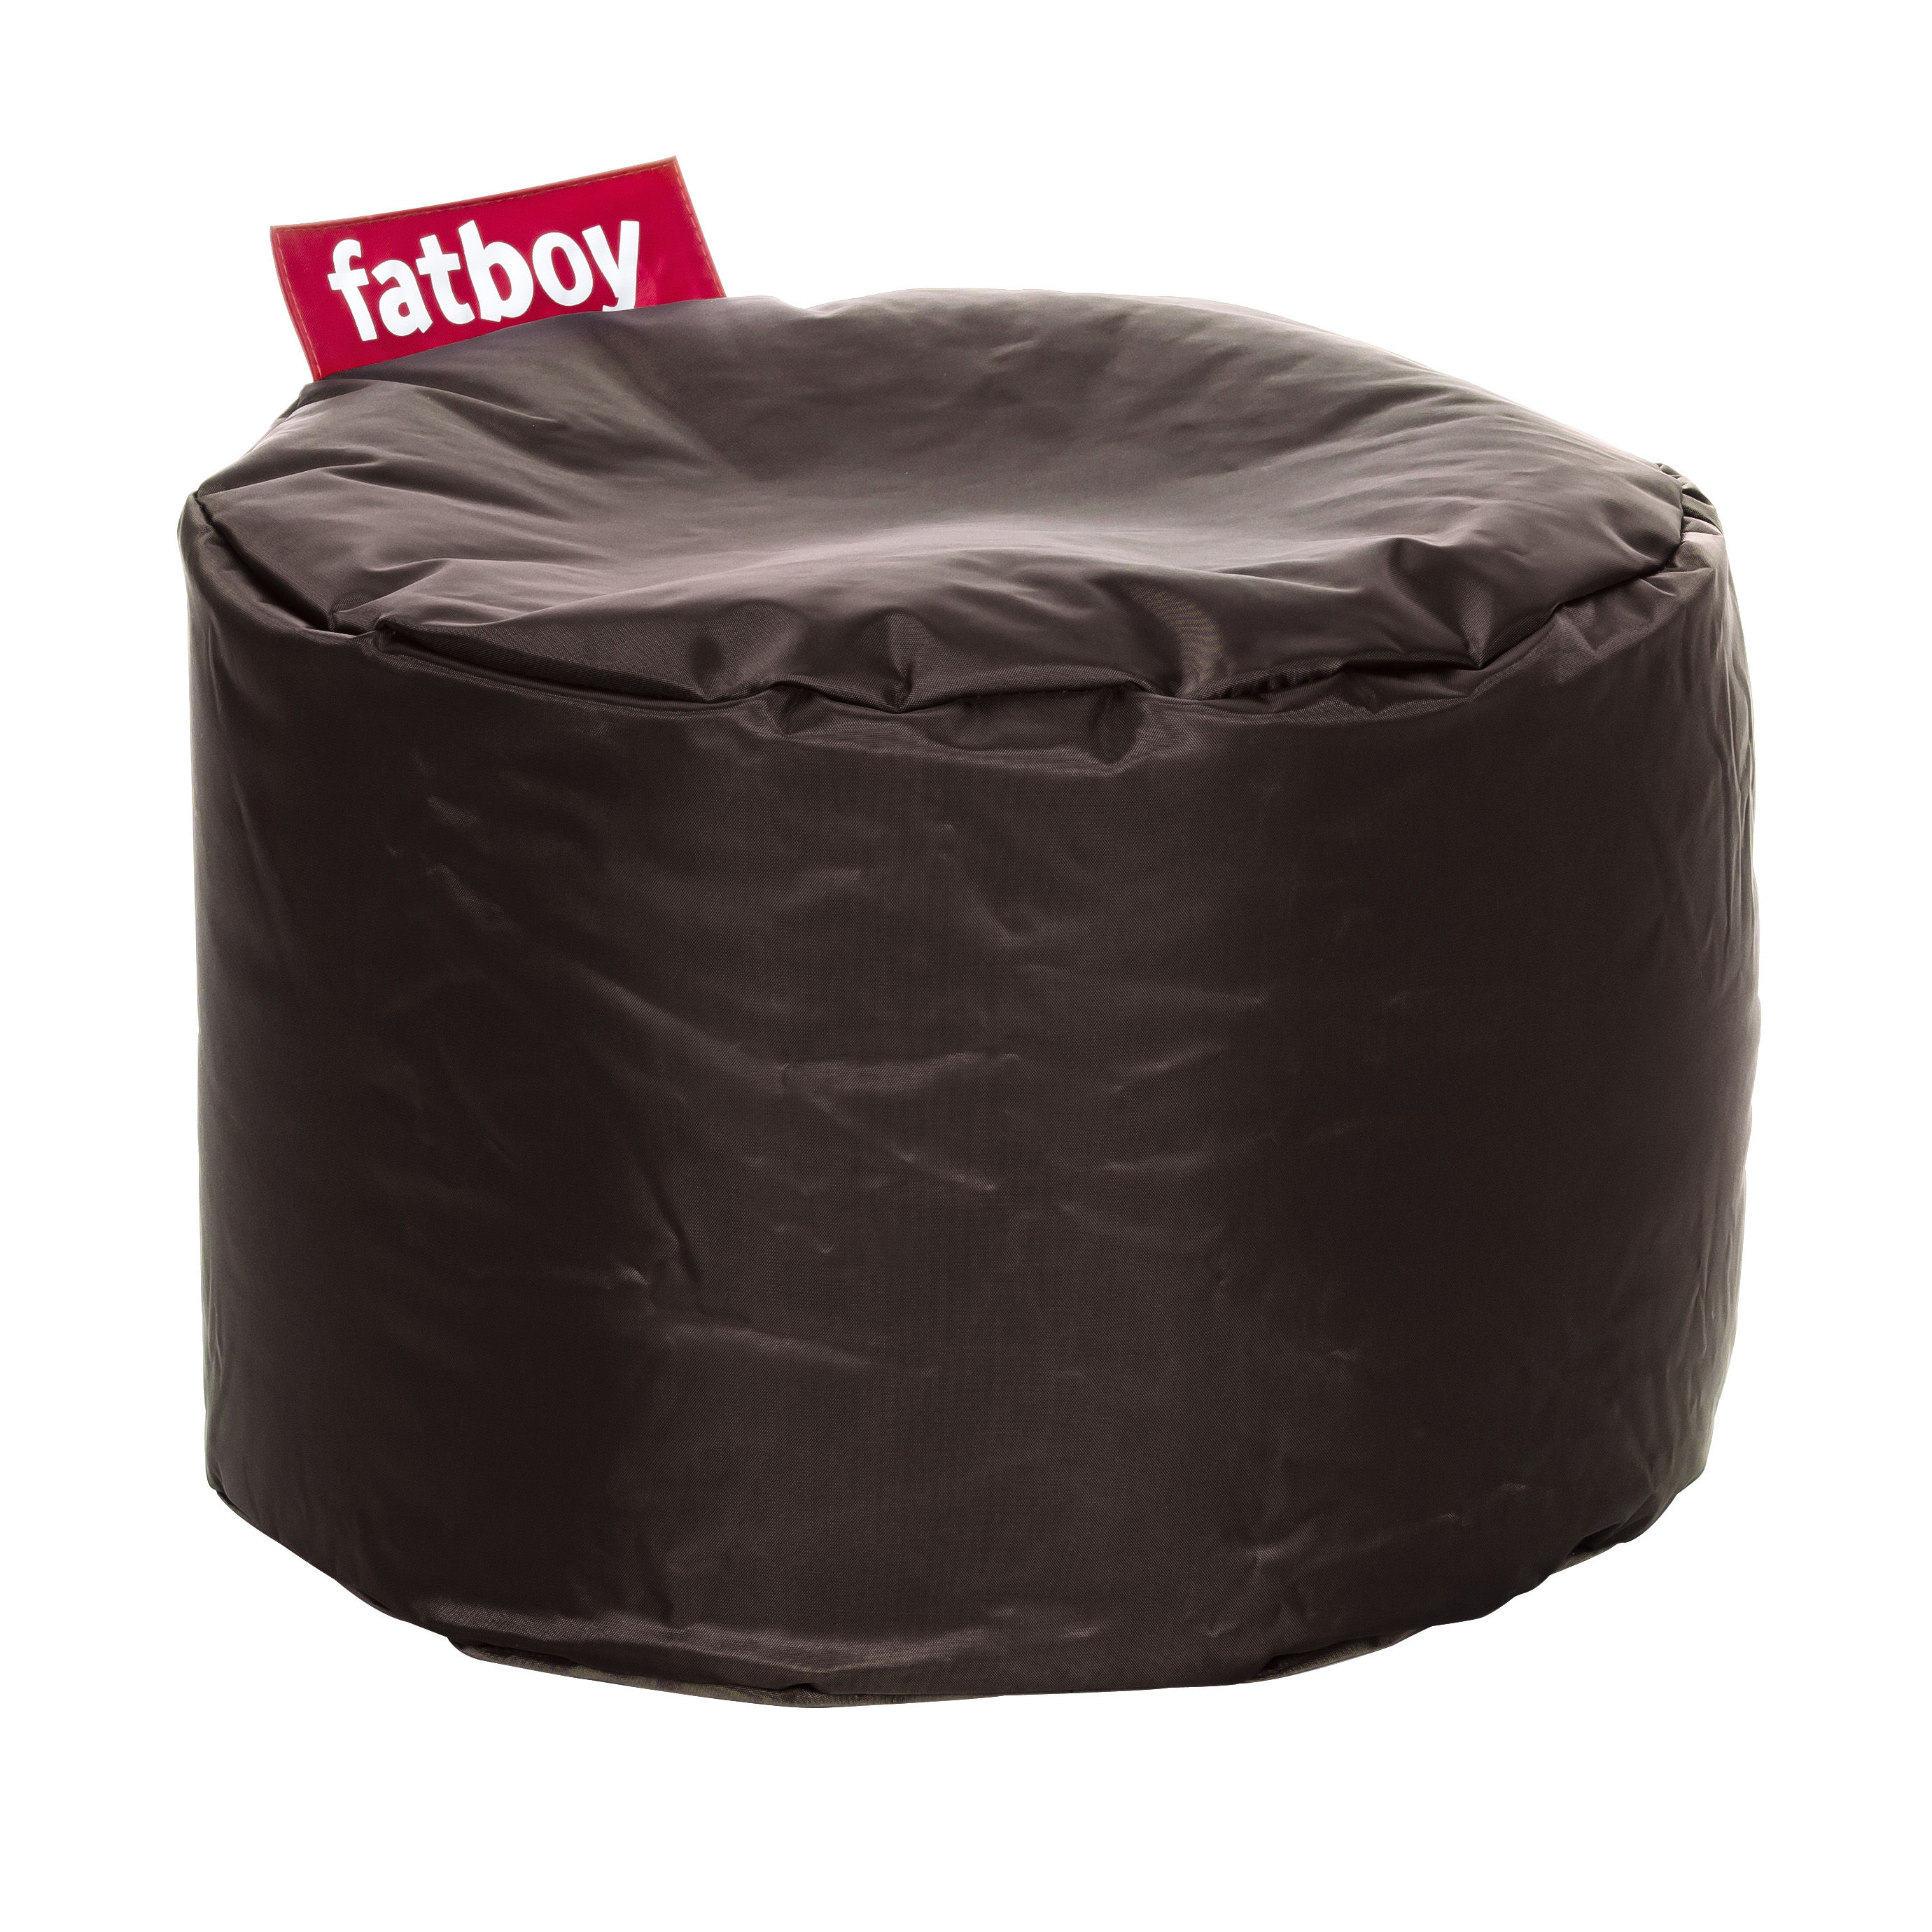 pouf point marron fatboy. Black Bedroom Furniture Sets. Home Design Ideas